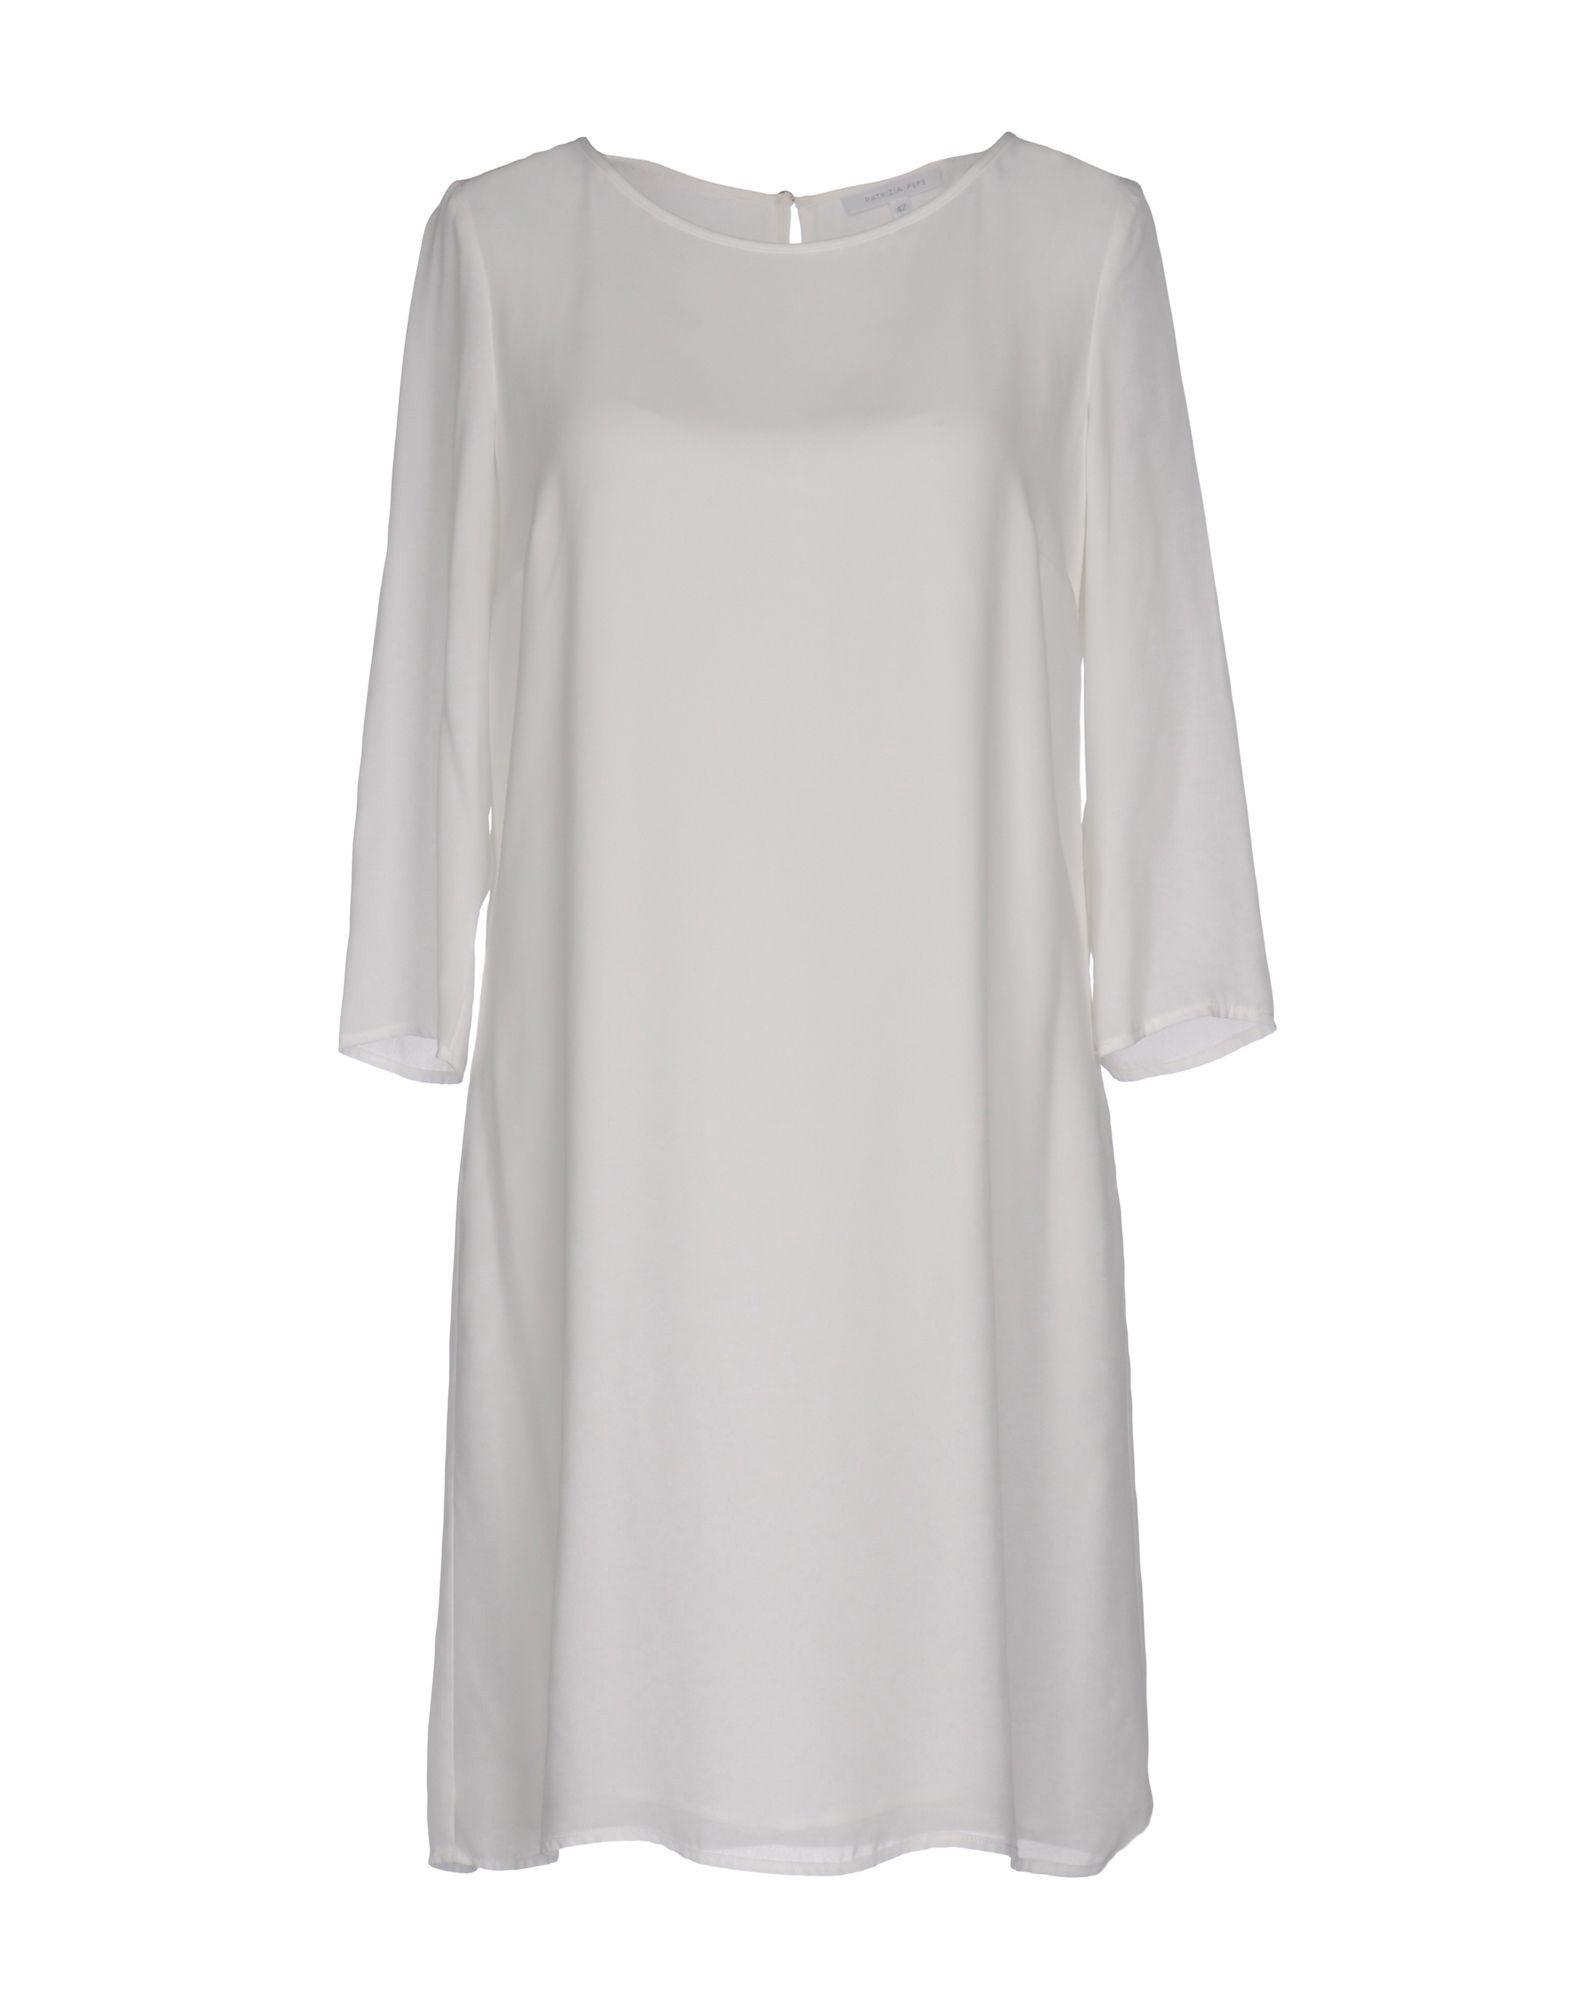 3a4685b89712 PATRIZIA PEPE Short dress.  patriziapepe  cloth